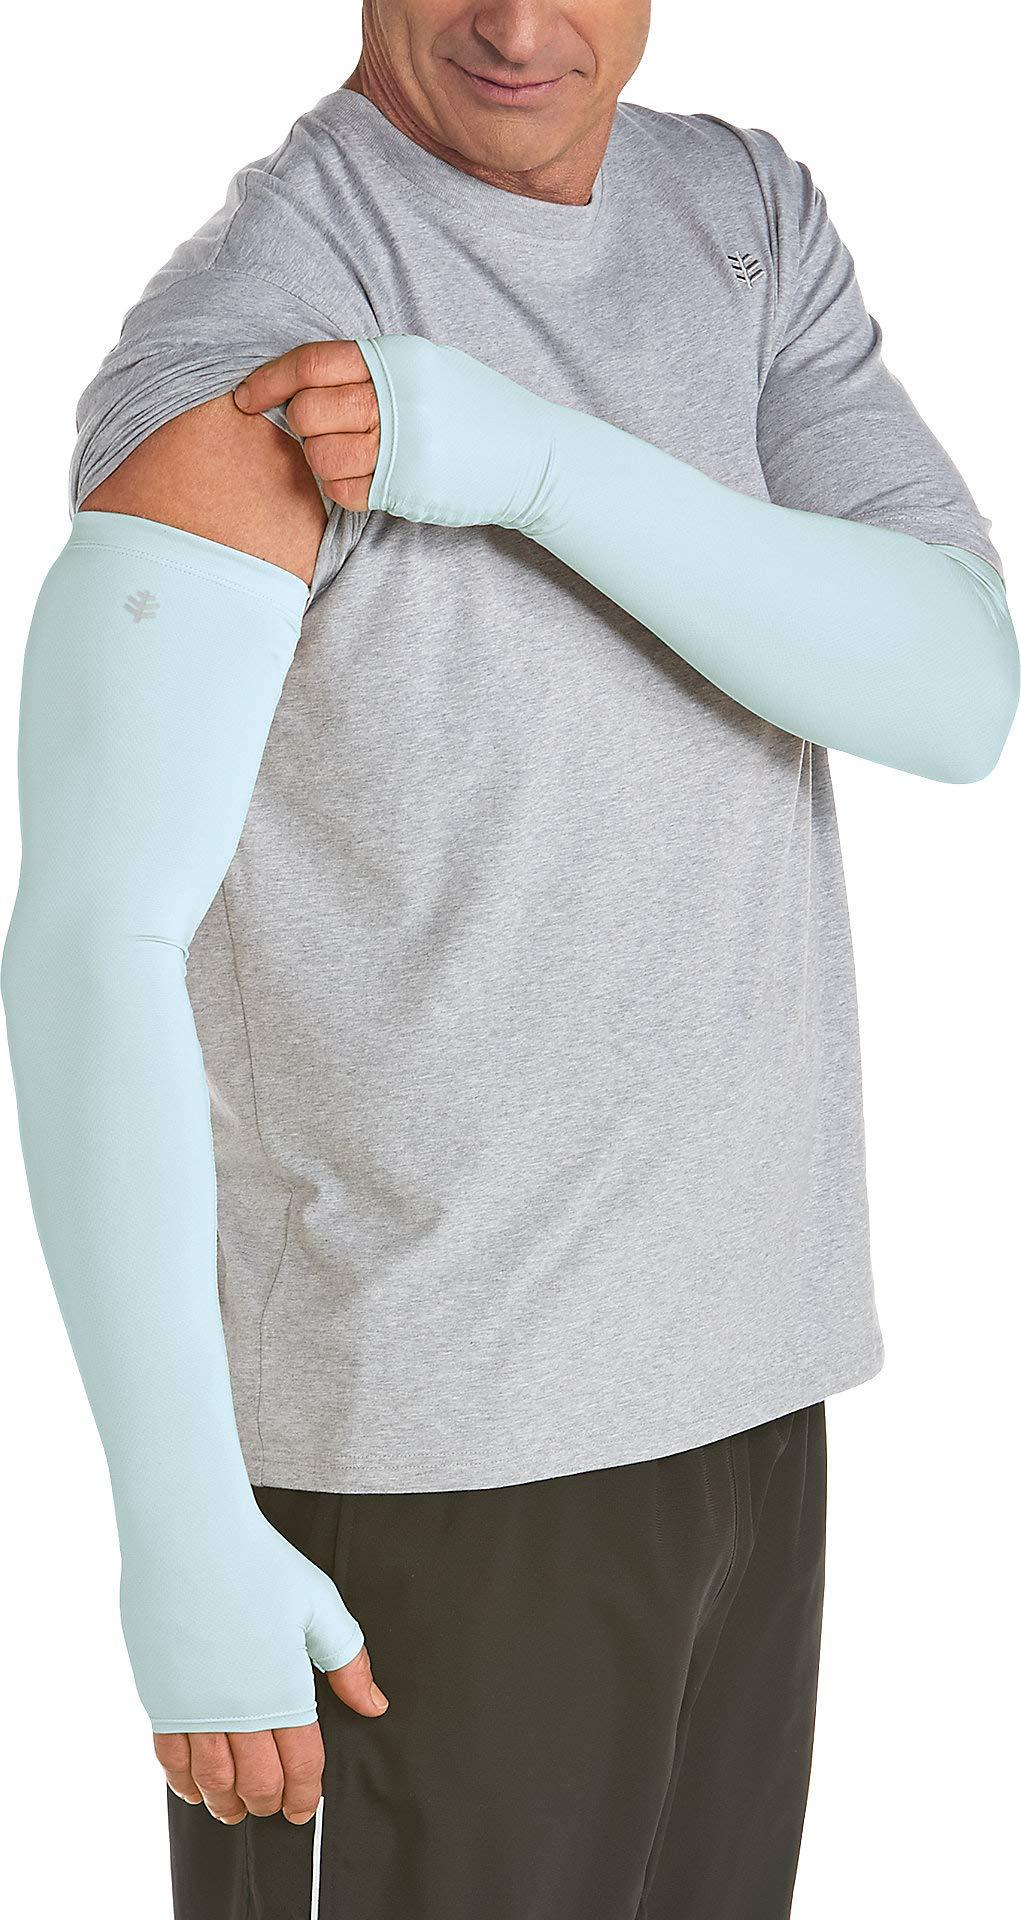 Coolibar UPF 50+ Unisex UV Protection Sleeves - Sun Protective (Large- Light Blue)